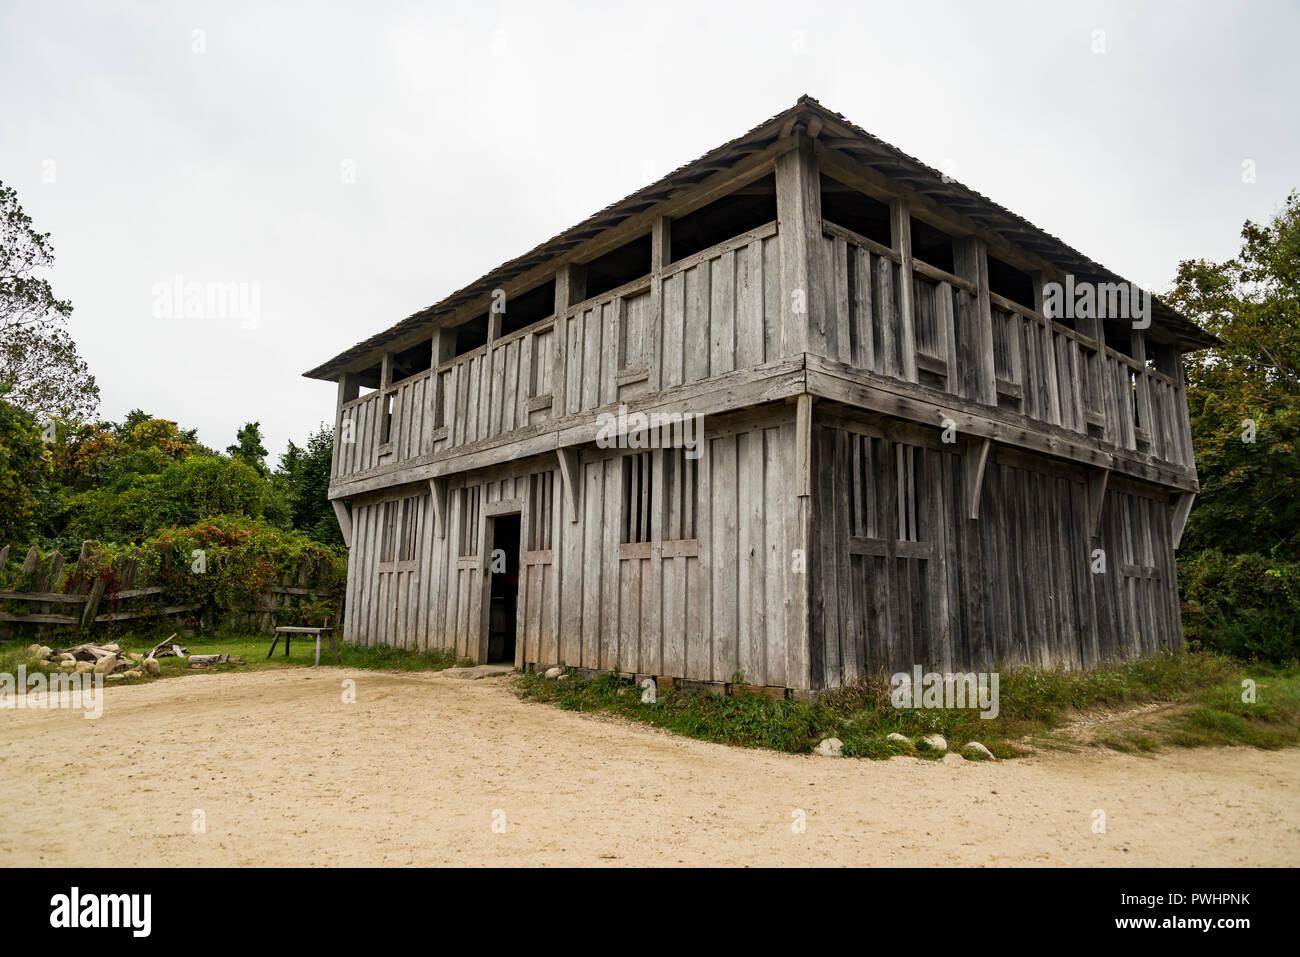 Alte Gebäude in Plimoth Plantation in Plymouth, MA Stockfoto